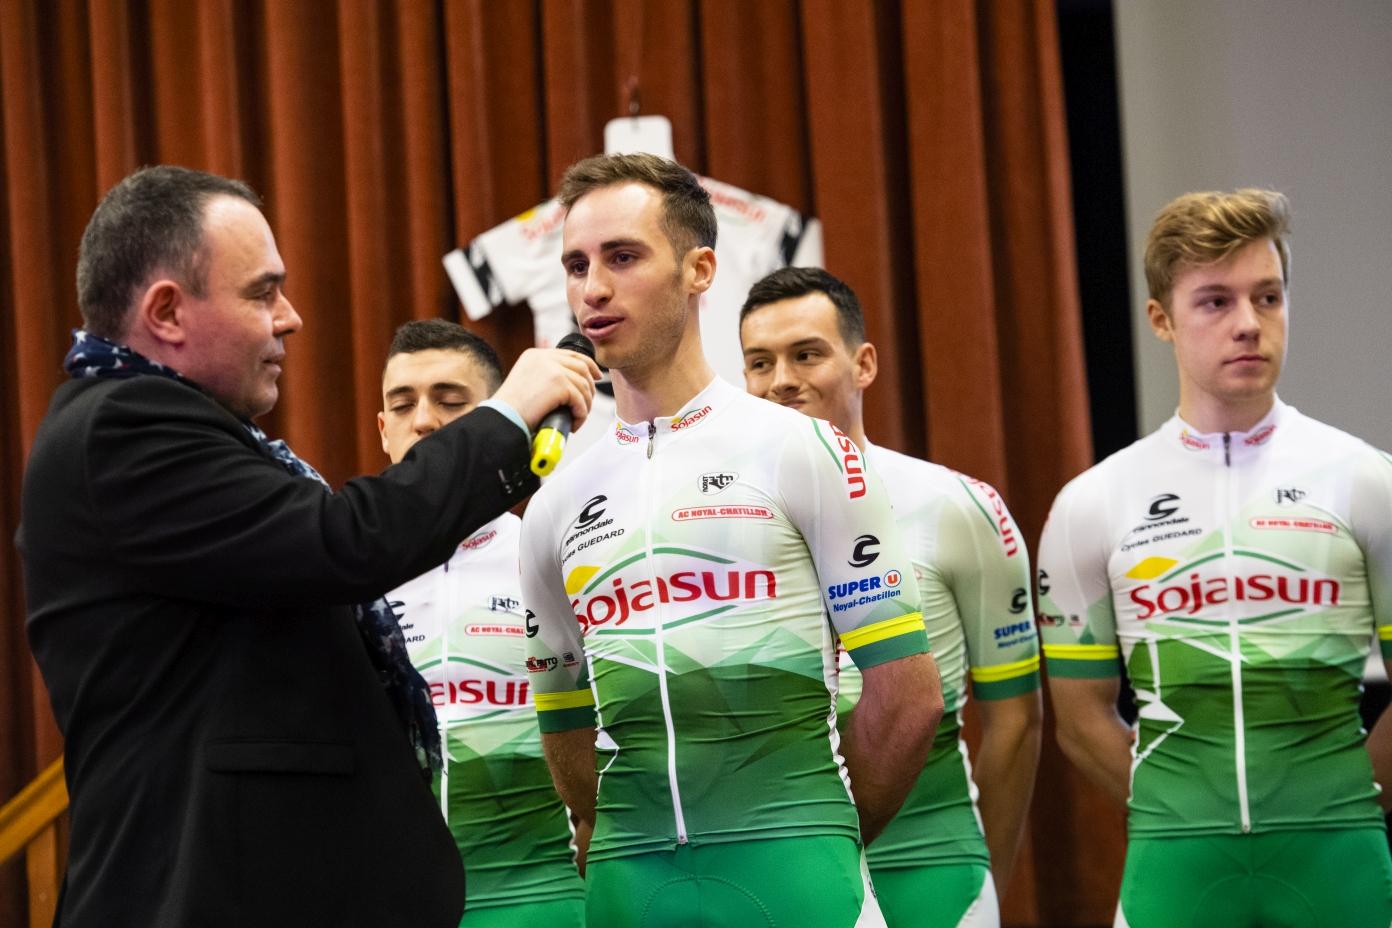 PRESENTATION DE L'EQUIPE CYCLISTE DE DN1 SOJASUN ESPOIR ACNC. NOYAL-CHATILLON SUR SEICHE, FRANCE, LE 18 JANVIER 2019.